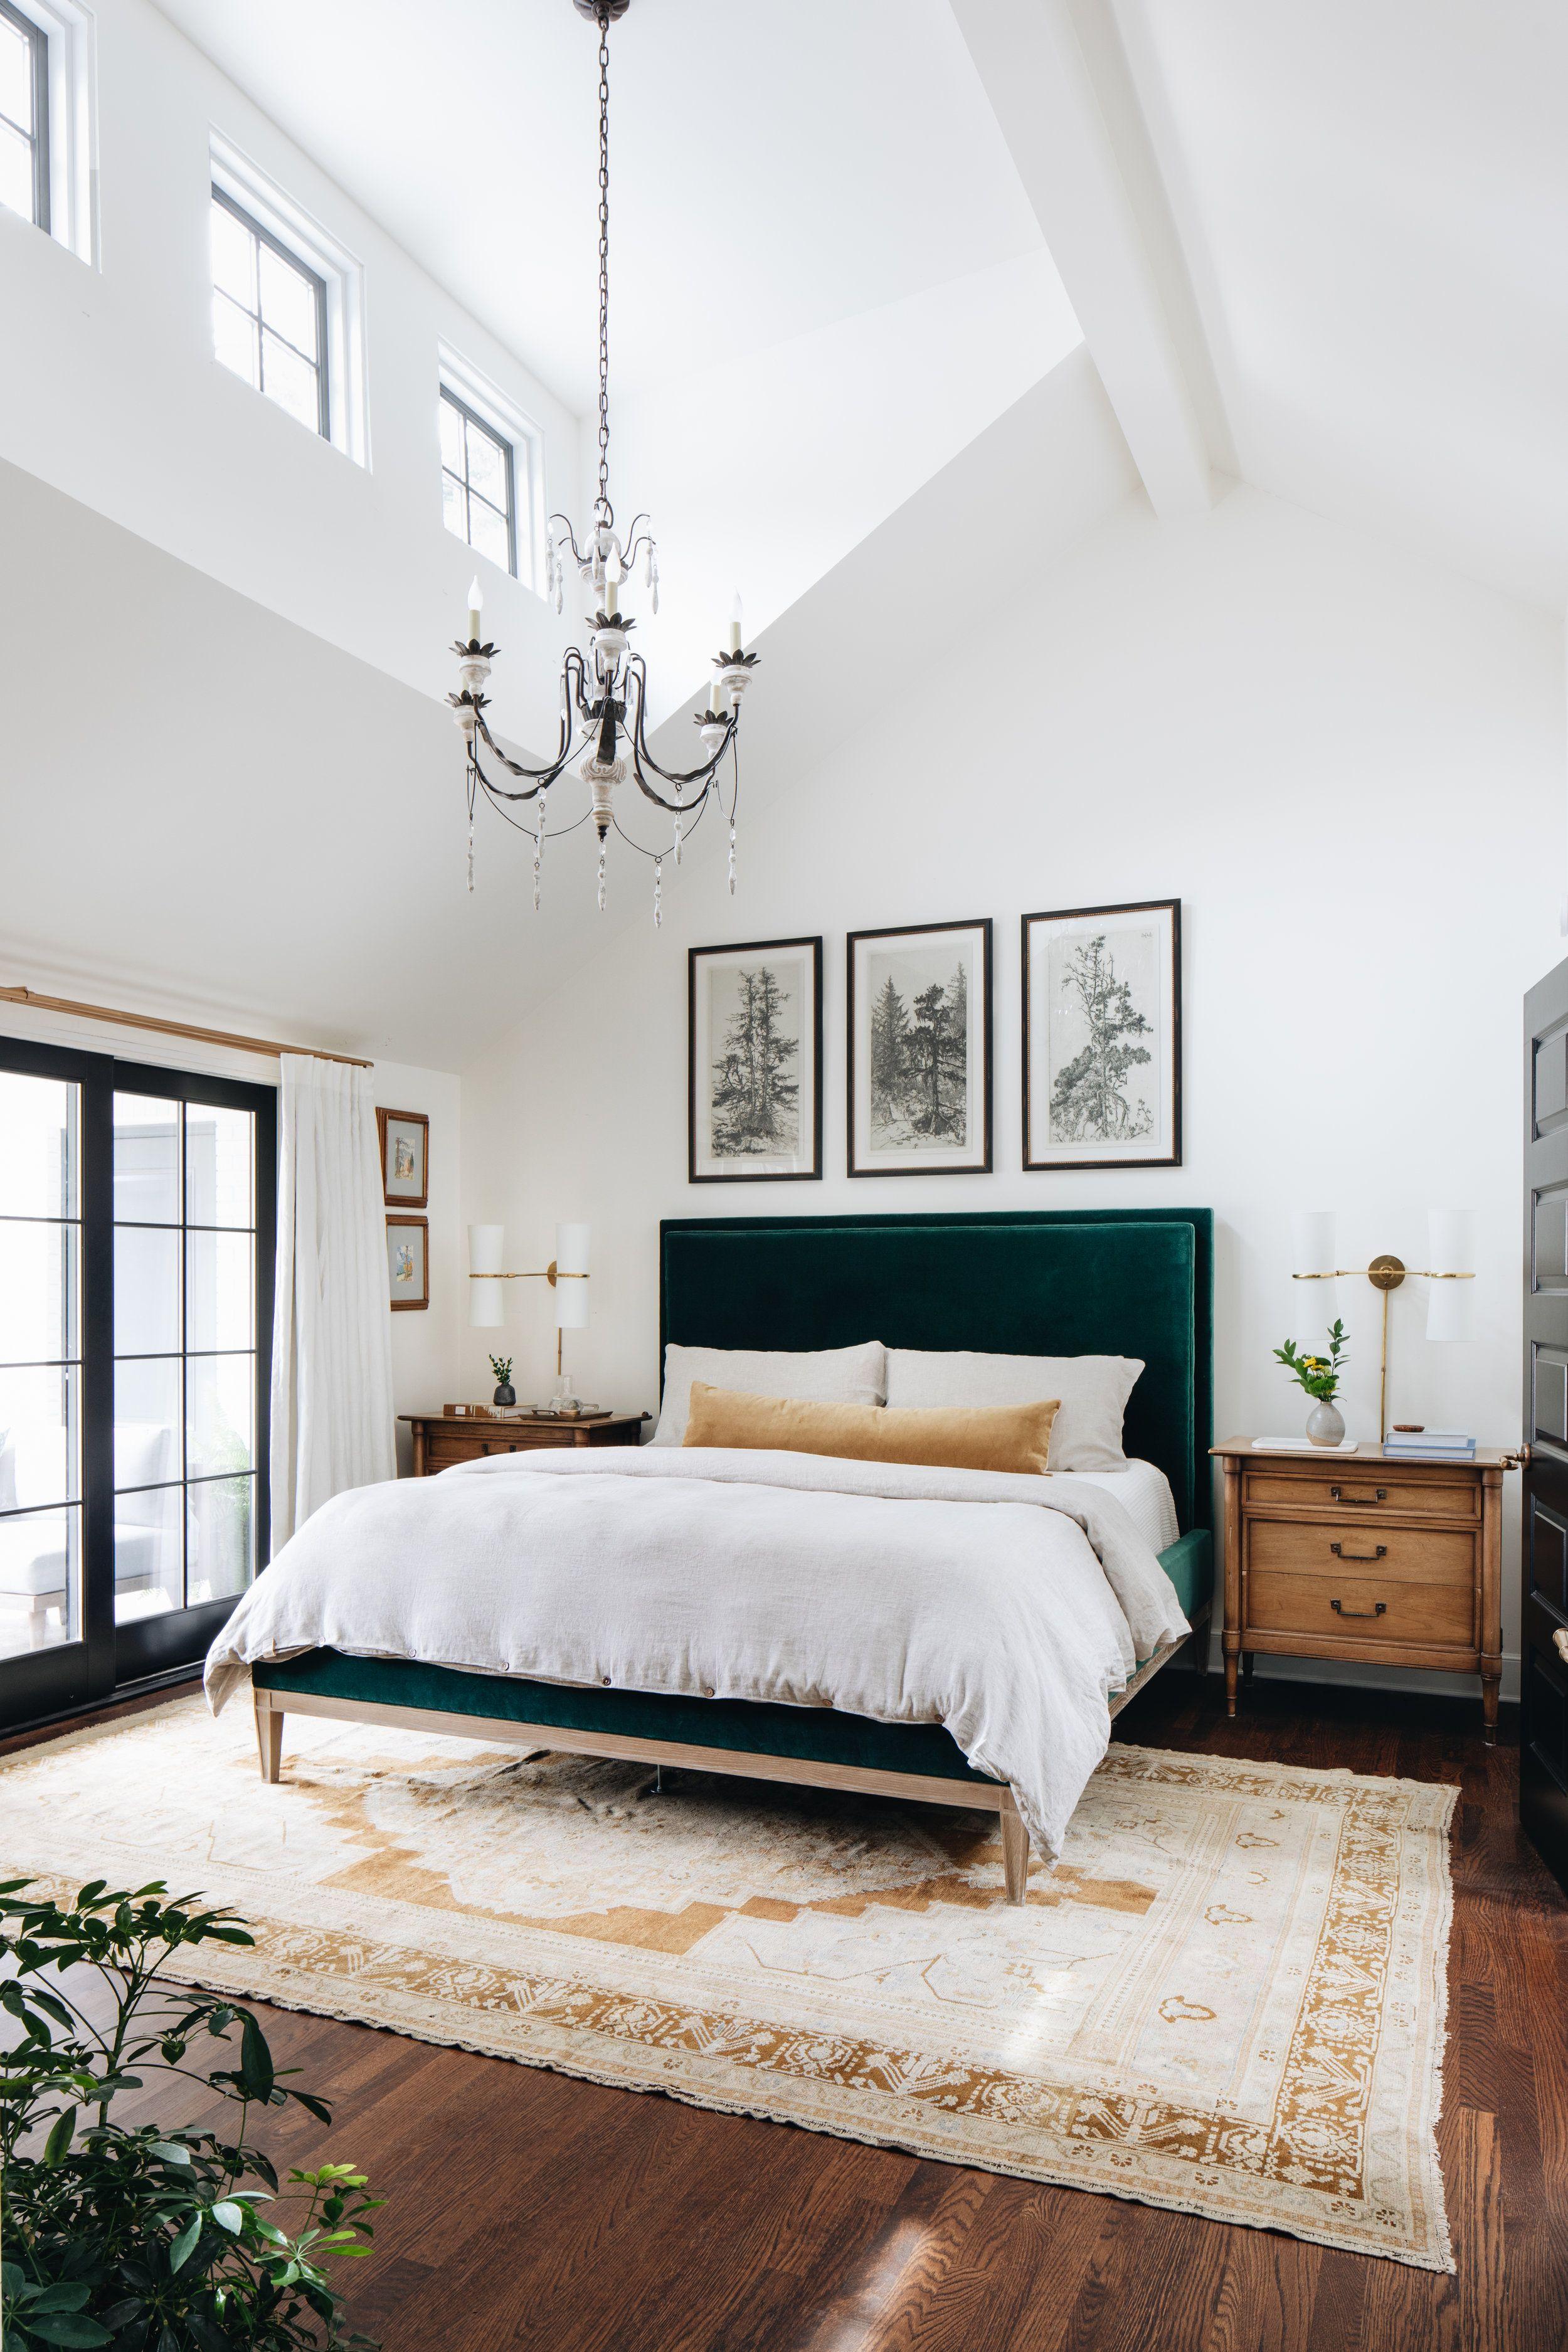 Bedroom Bedroom Design Vaulted Ceilings White Walls Green